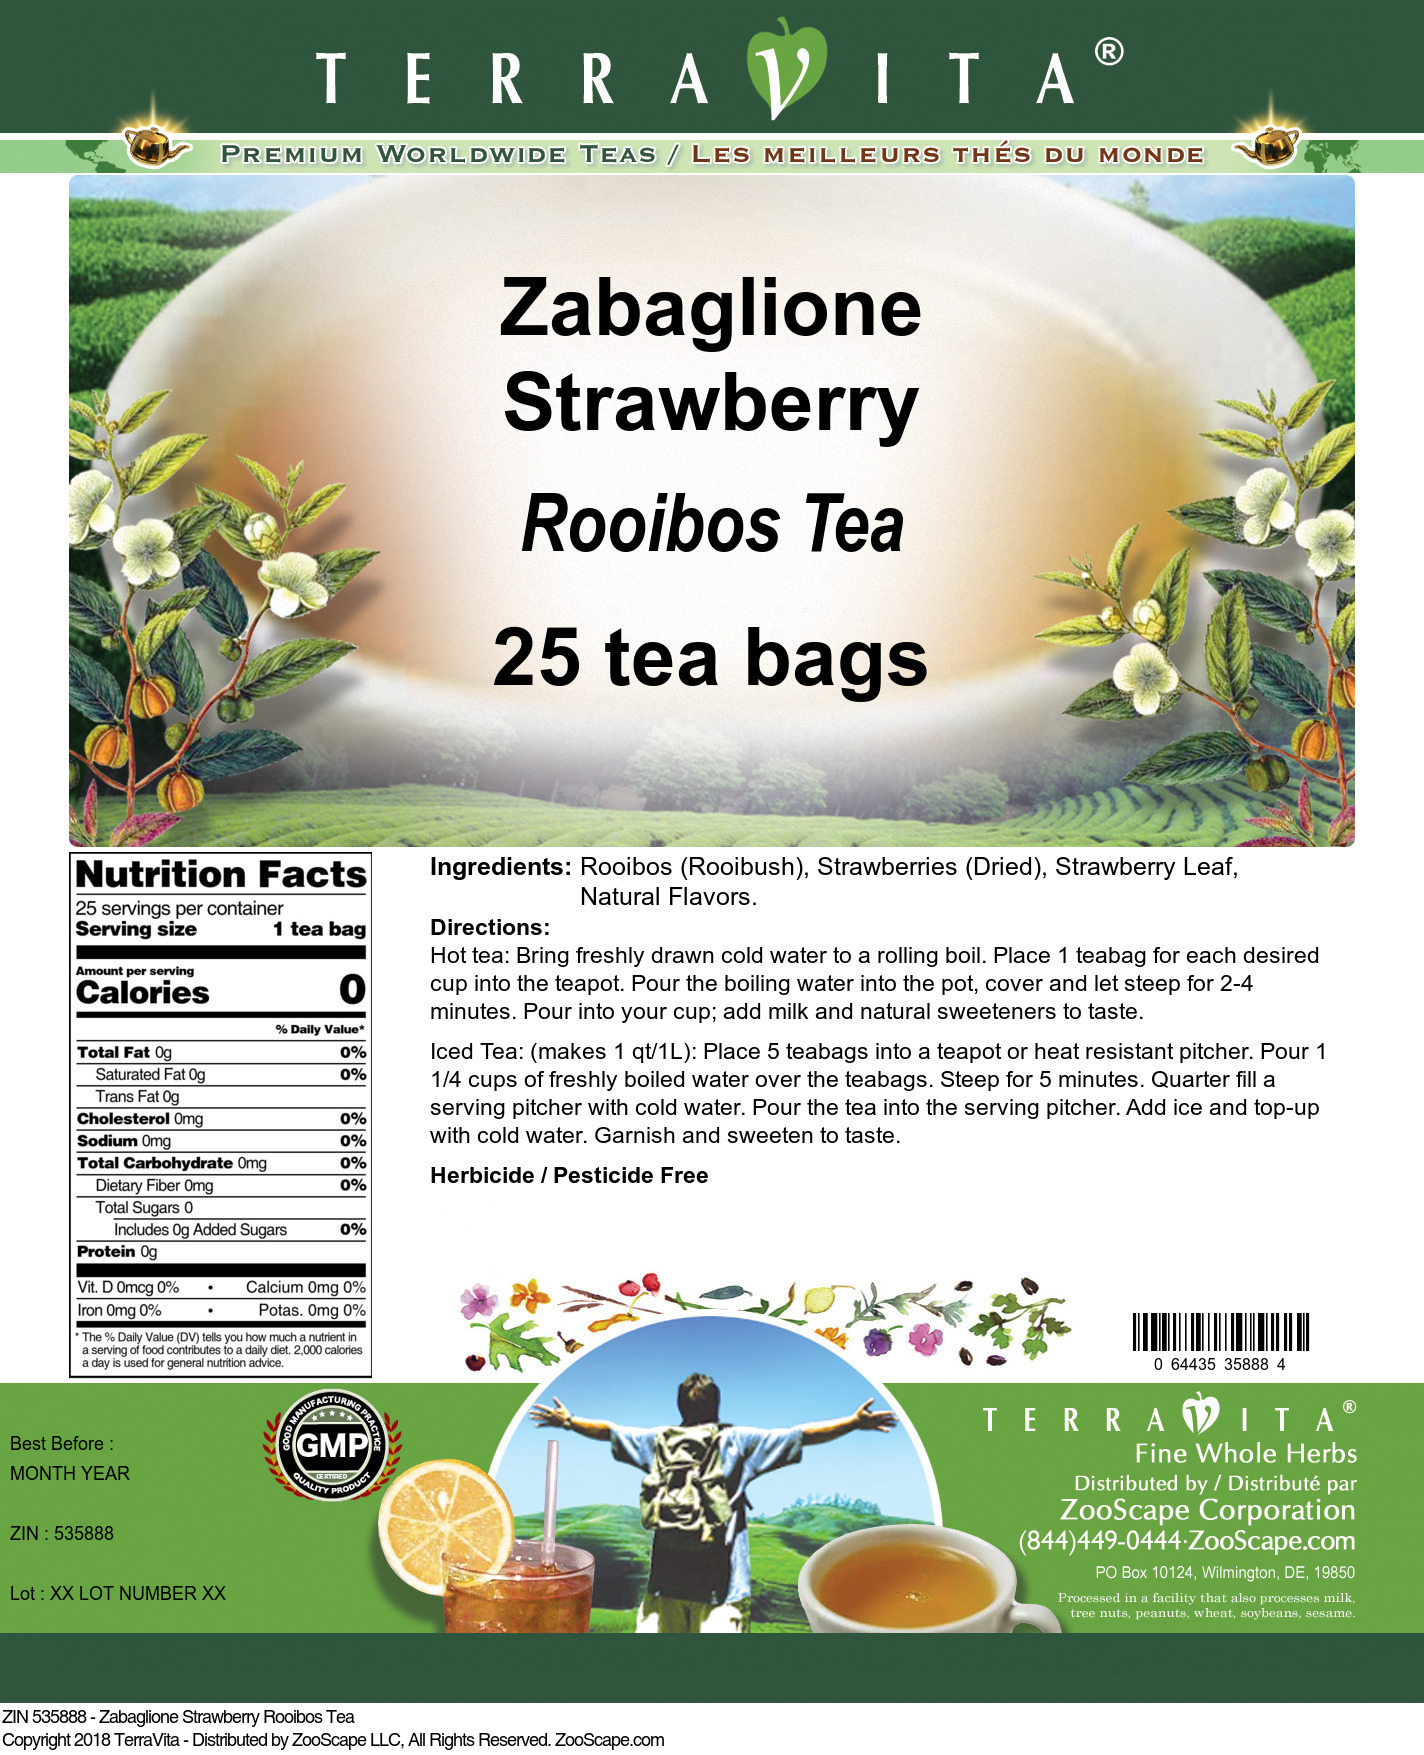 Zabaglione Strawberry Rooibos Tea